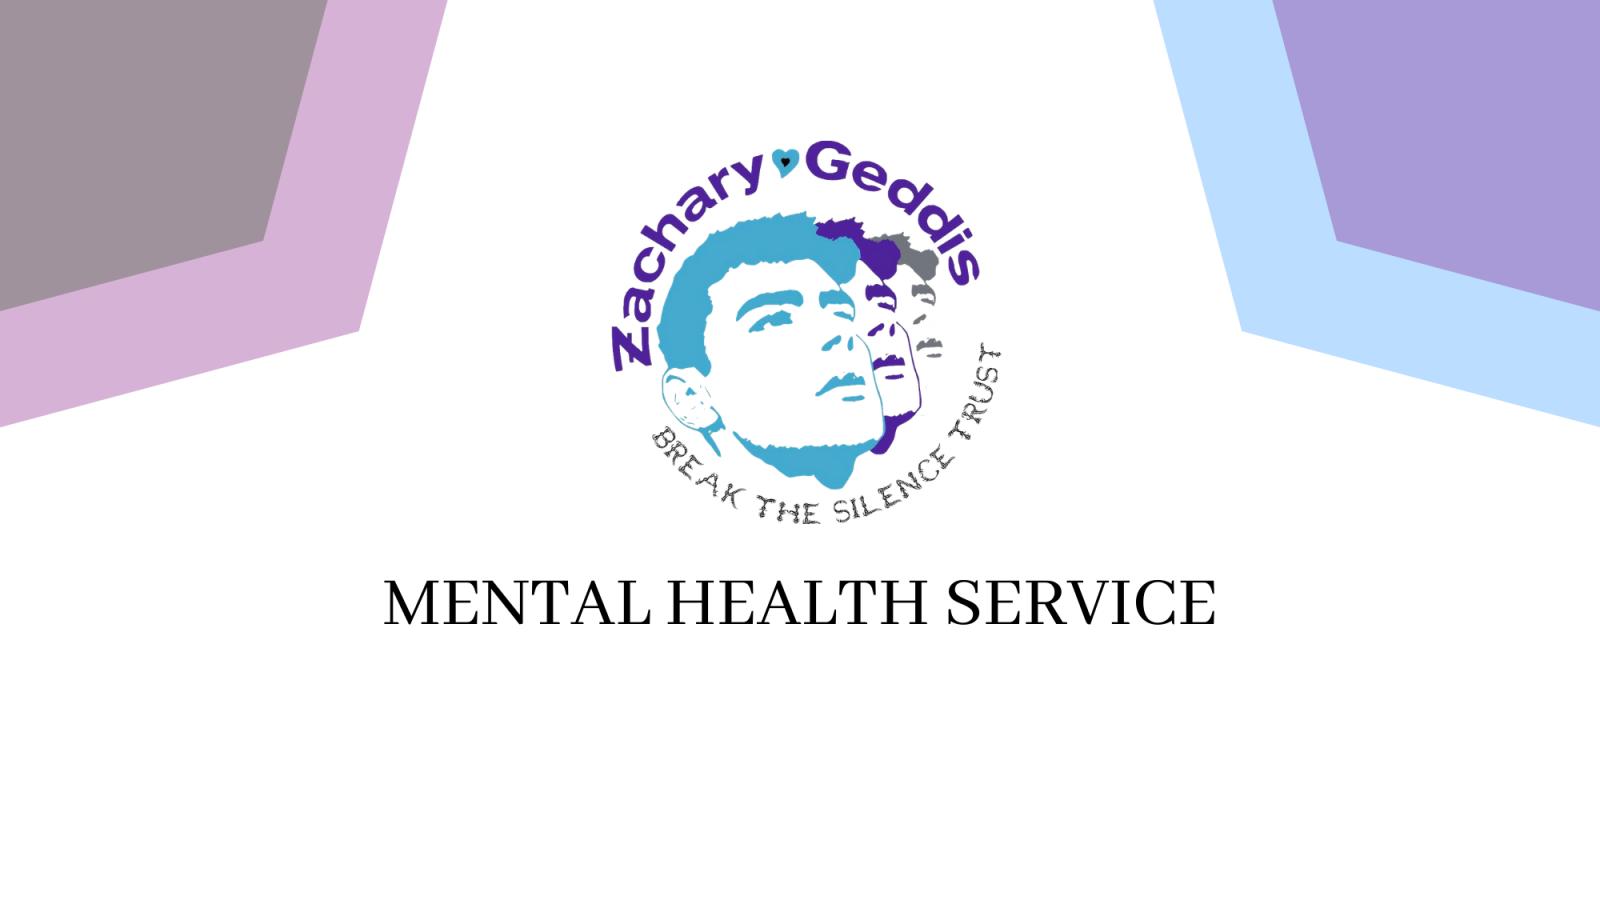 Zachary Geddis Break The Silence Trust (ZGBTST)